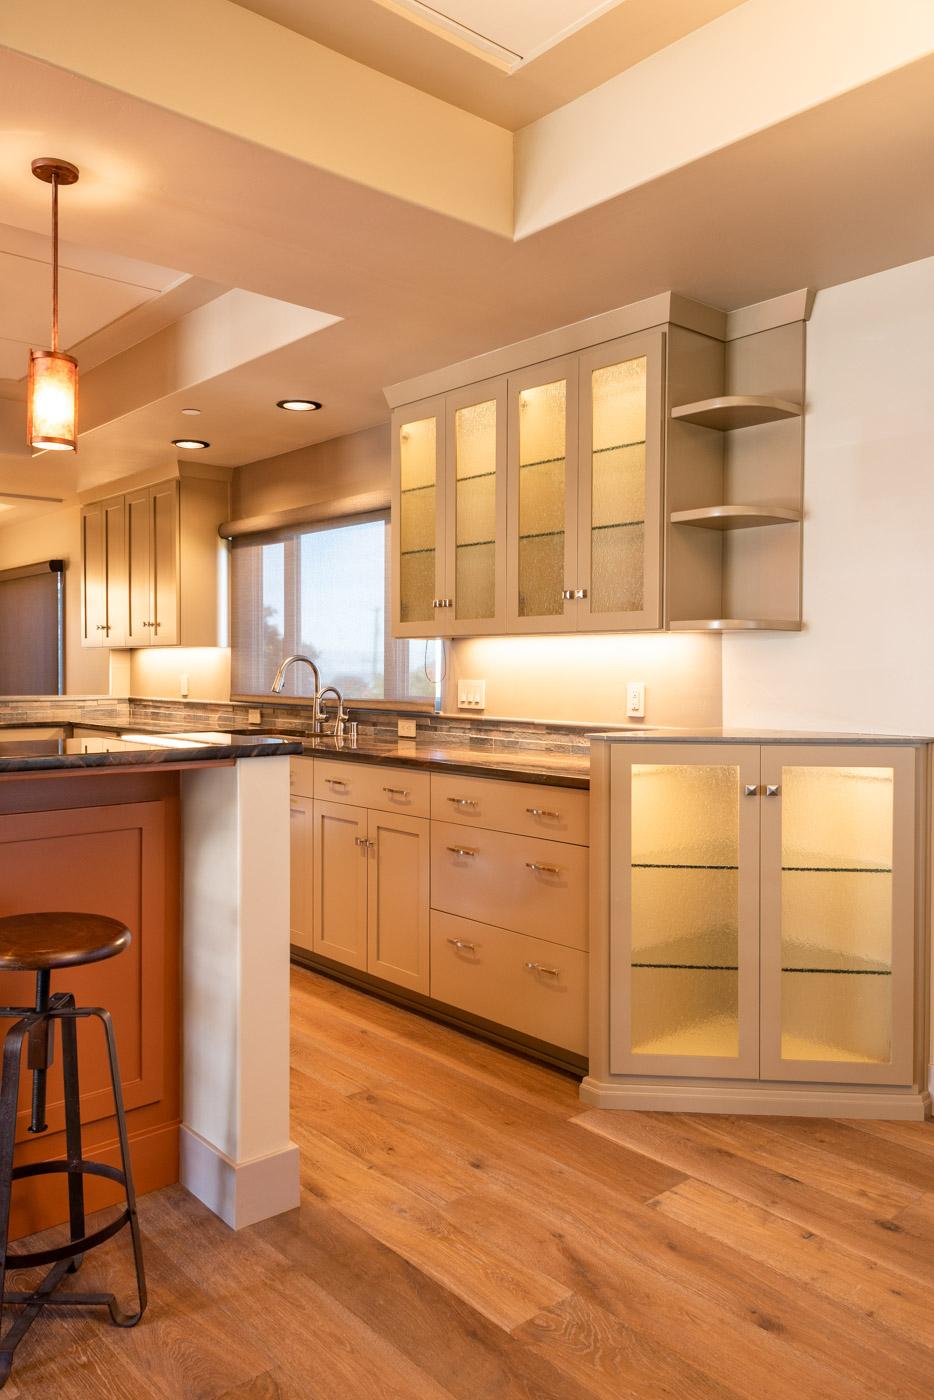 Craftsman Beach House Custom Kitchen And Bathroom Cabinets In Morro Bay California Sligh Cabinets Inc